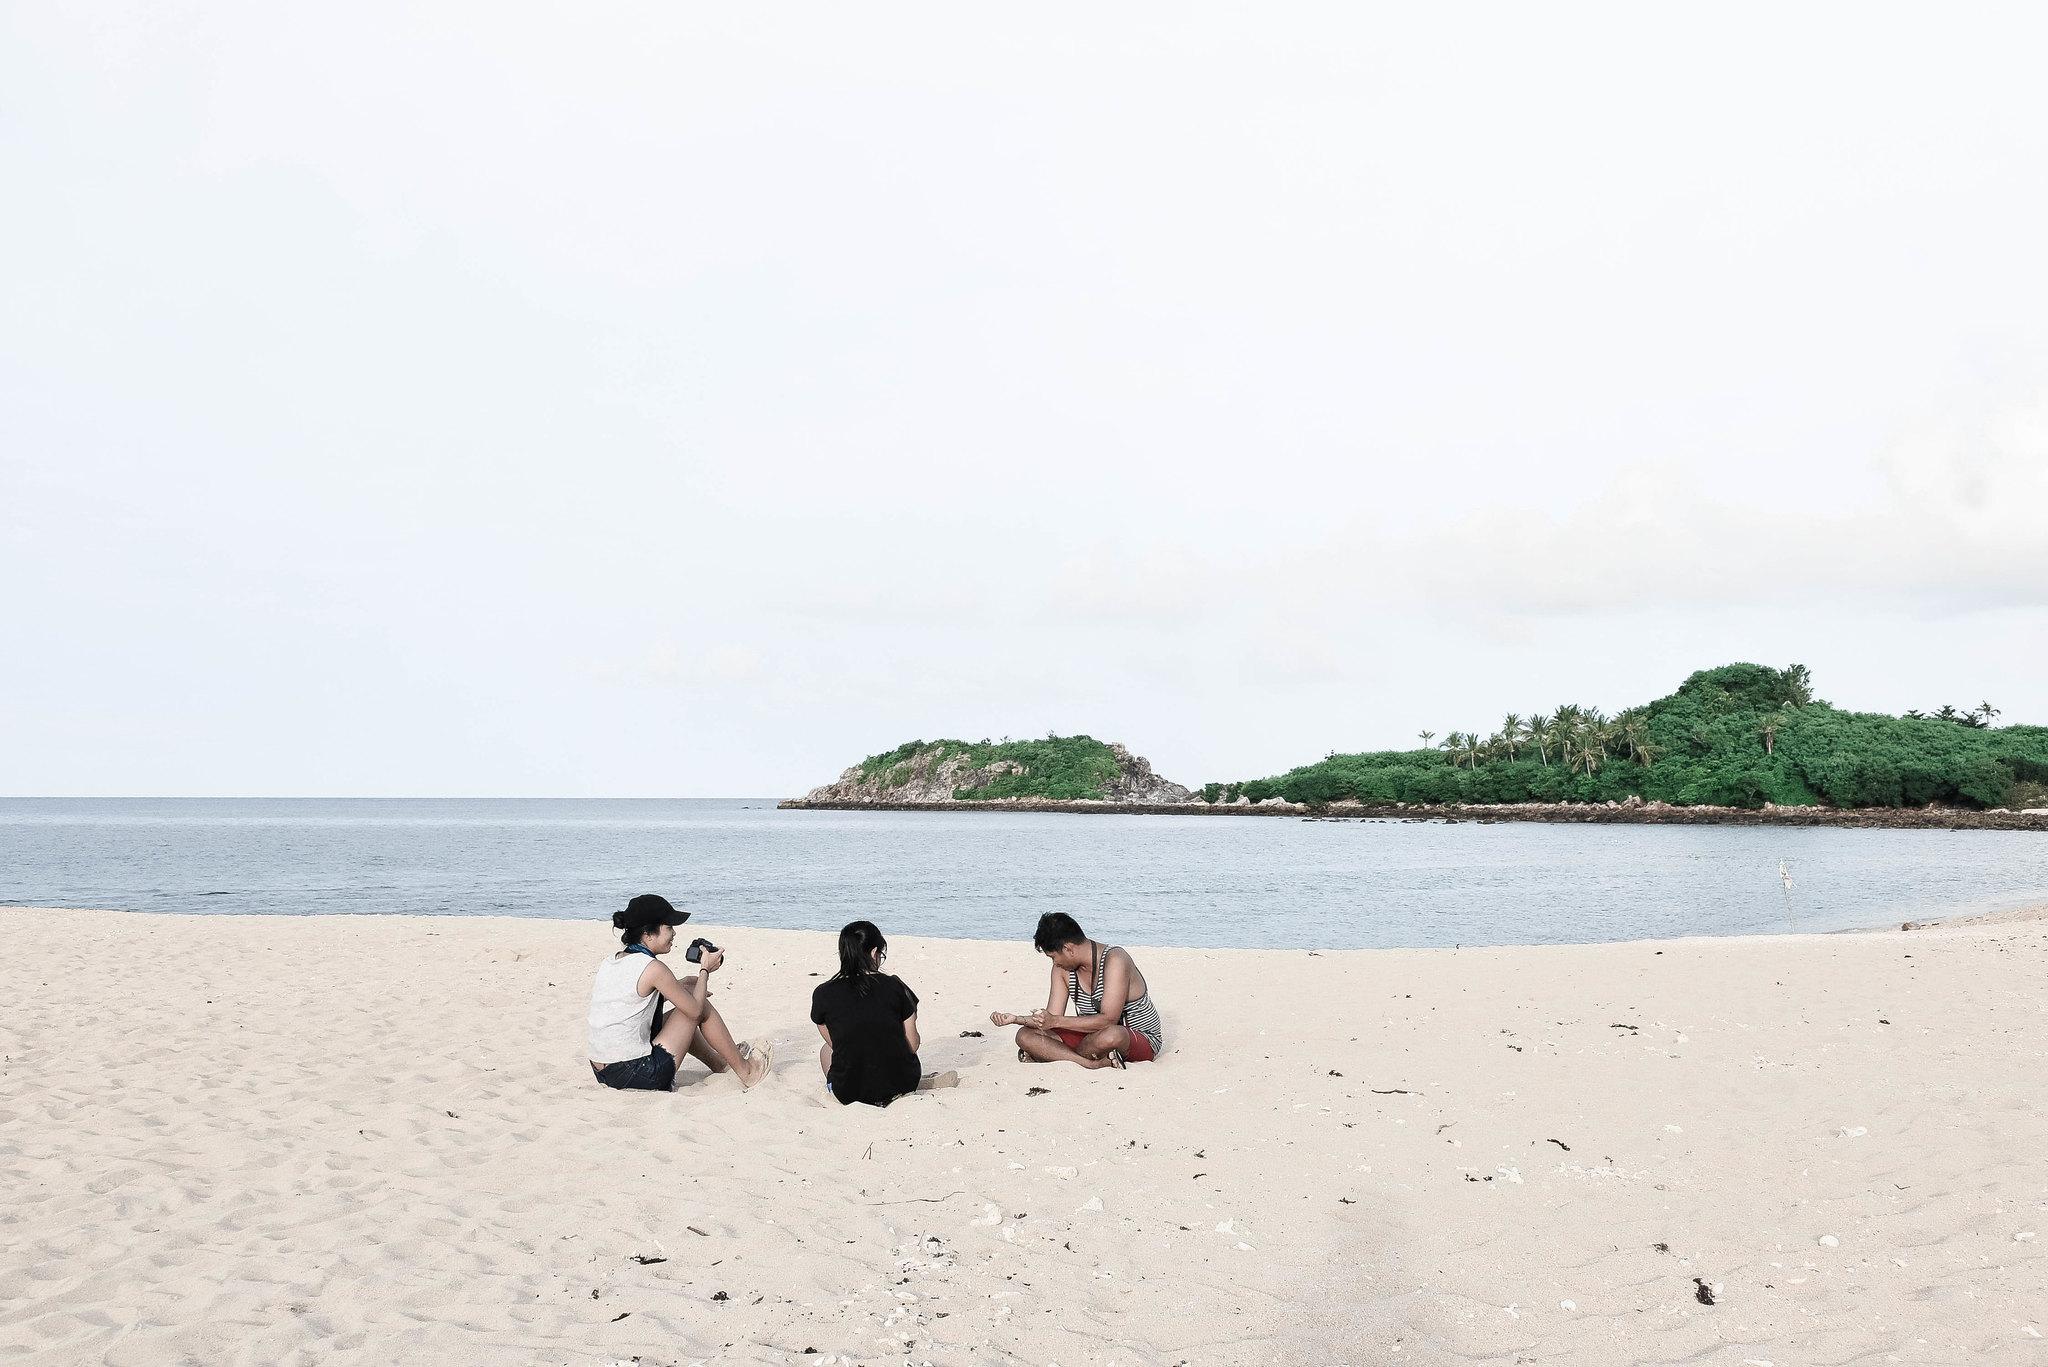 gigantes island bantigue sandbar (1 of 1)